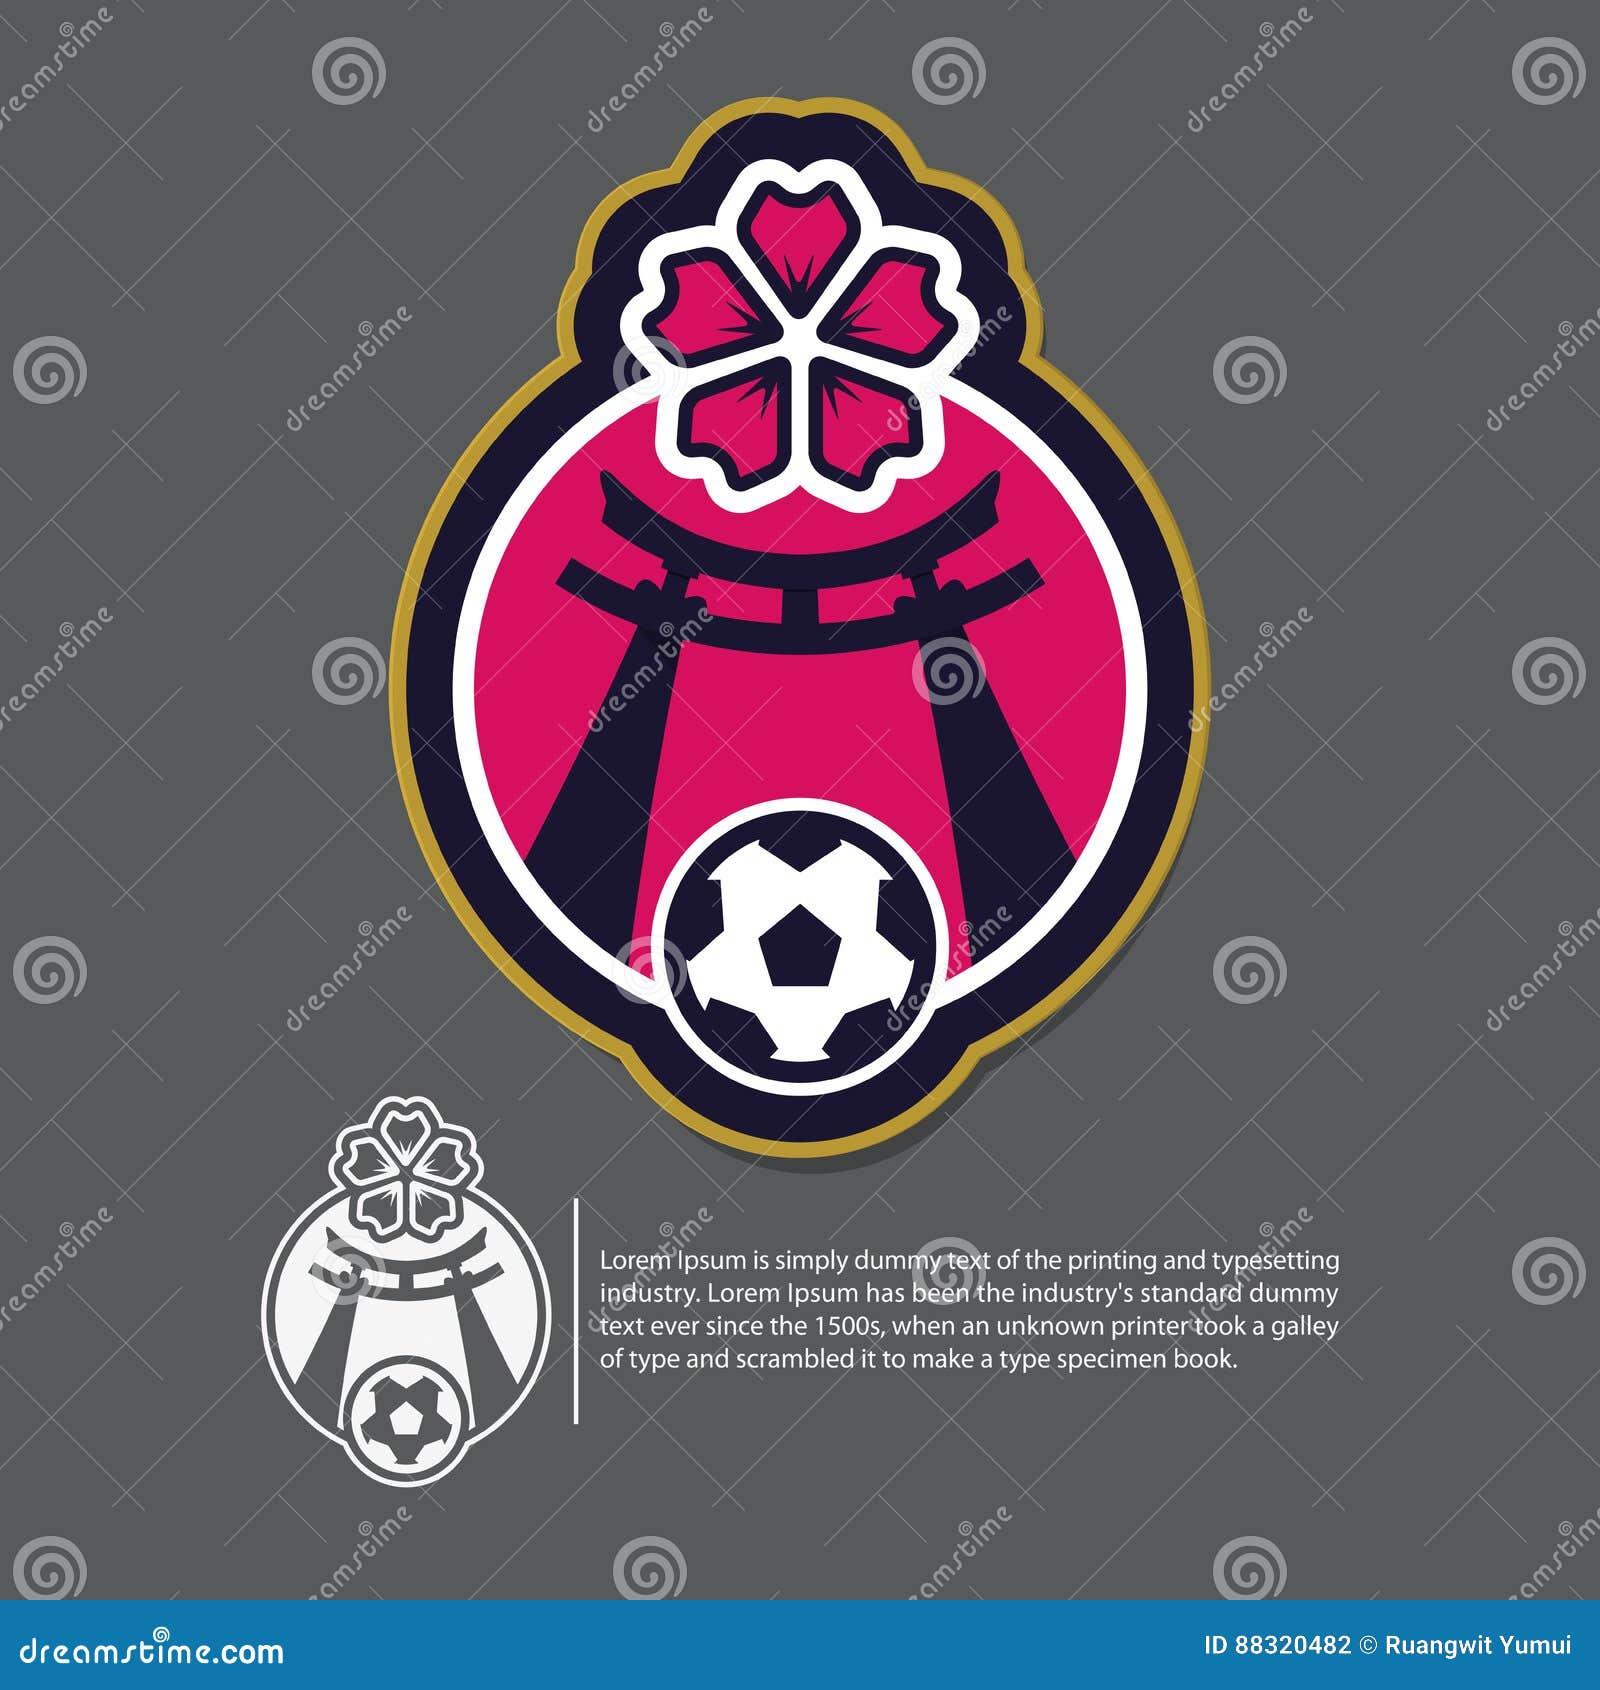 c8c9b9290 Soccer or football logo design in Japan concept. Sport team identity  tempalt. Vector.